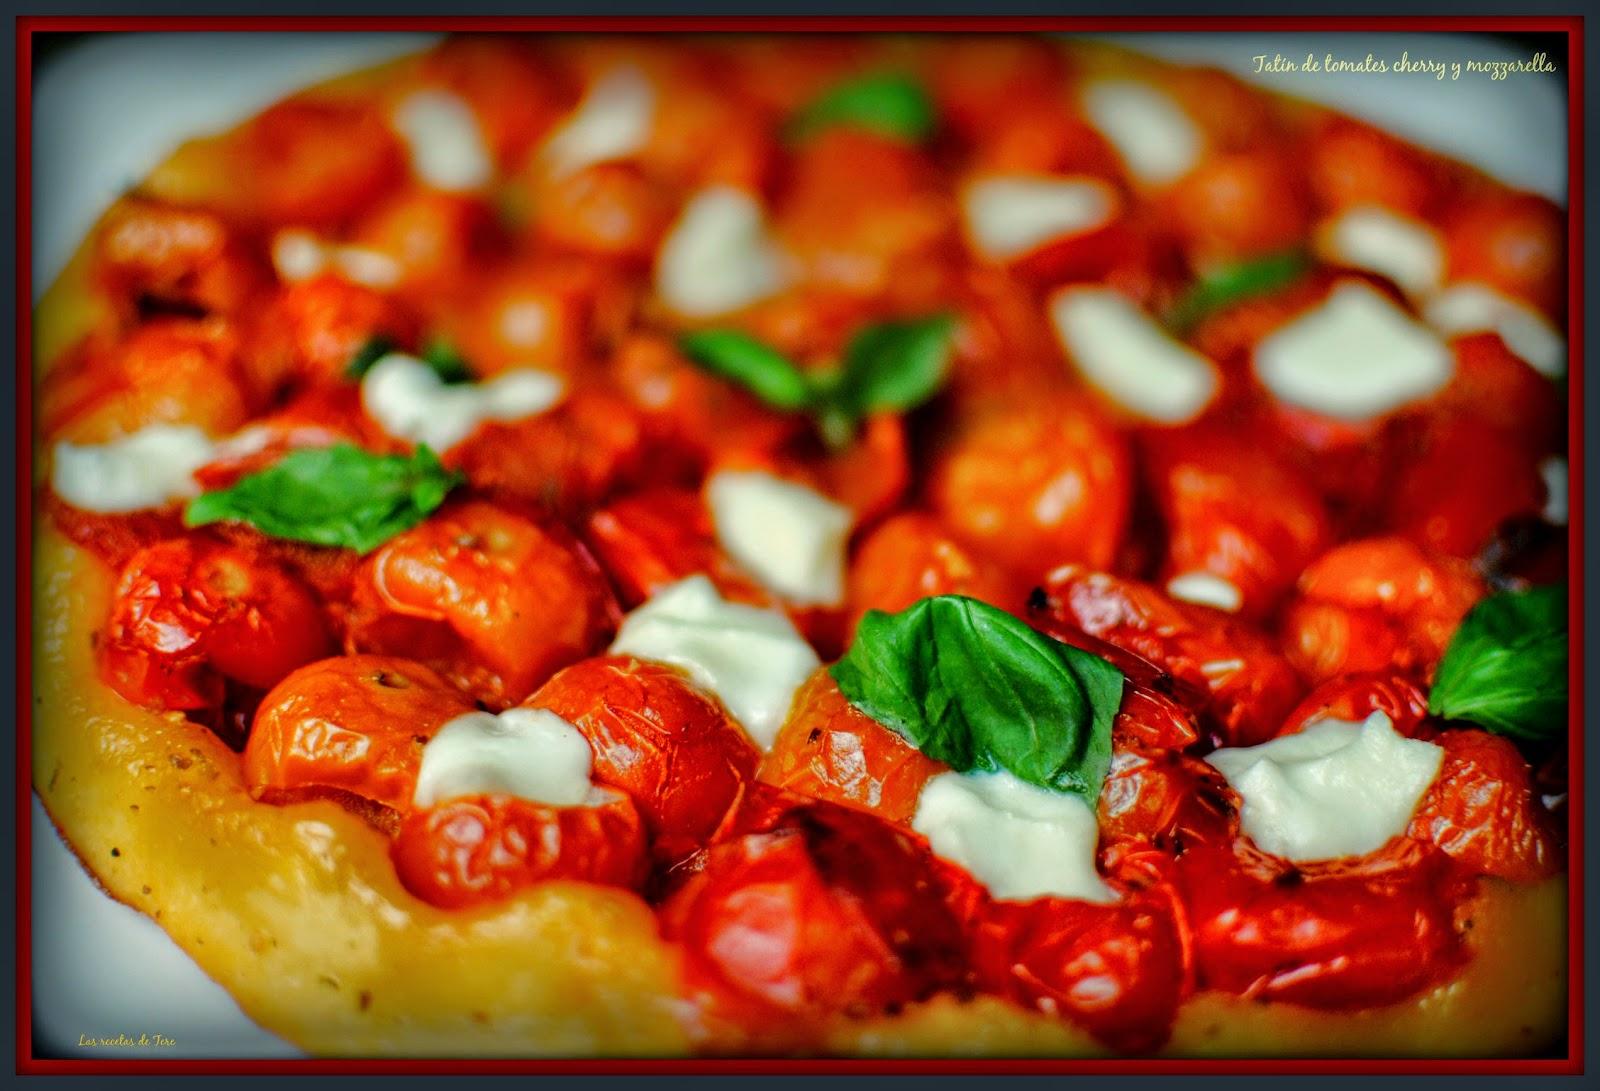 tatín de tomates cherry y mozzarella tererecetas 06